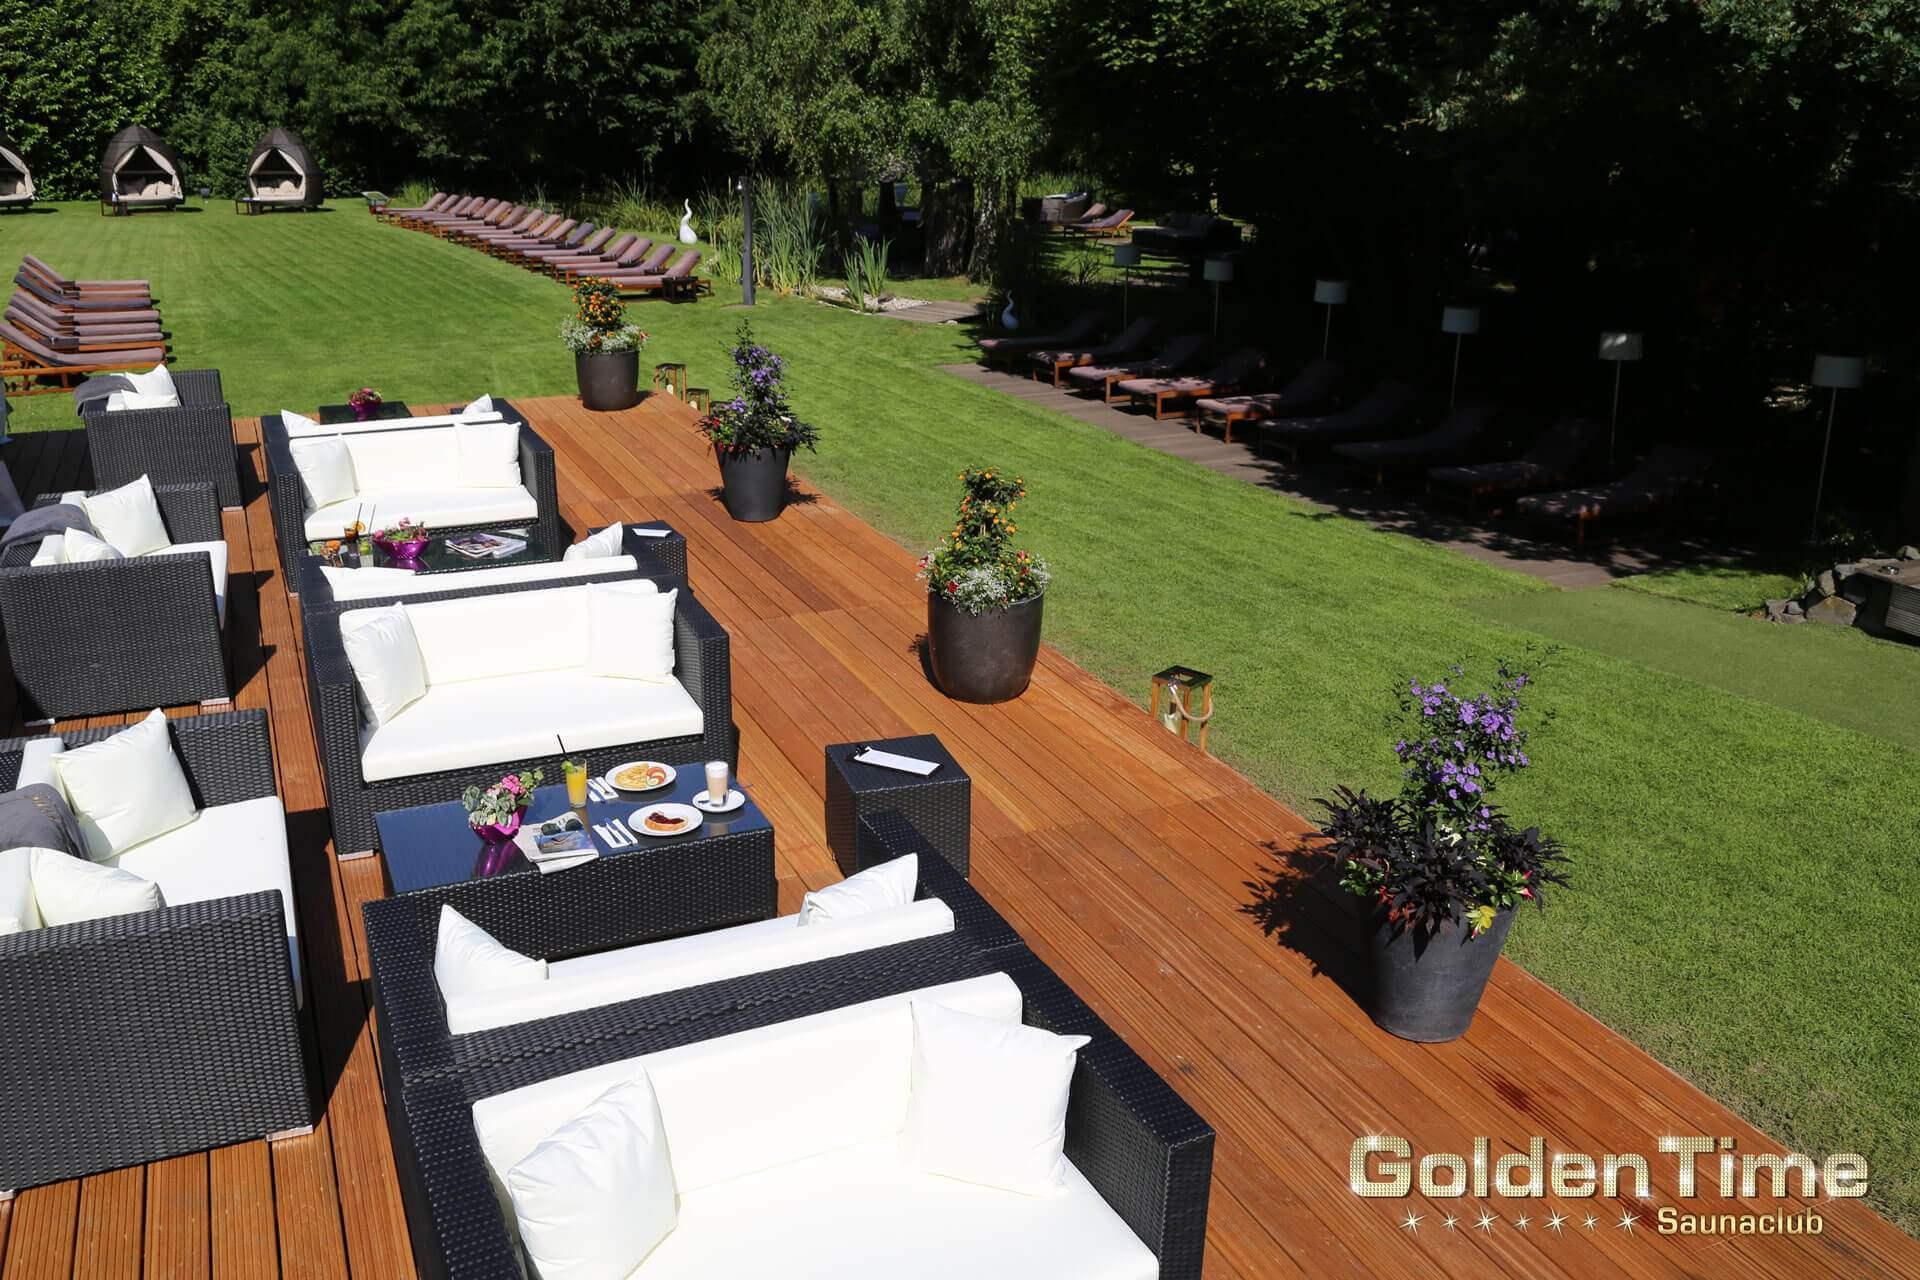 01-terrasse-pic-06-goldentime-saunaclub.jpg